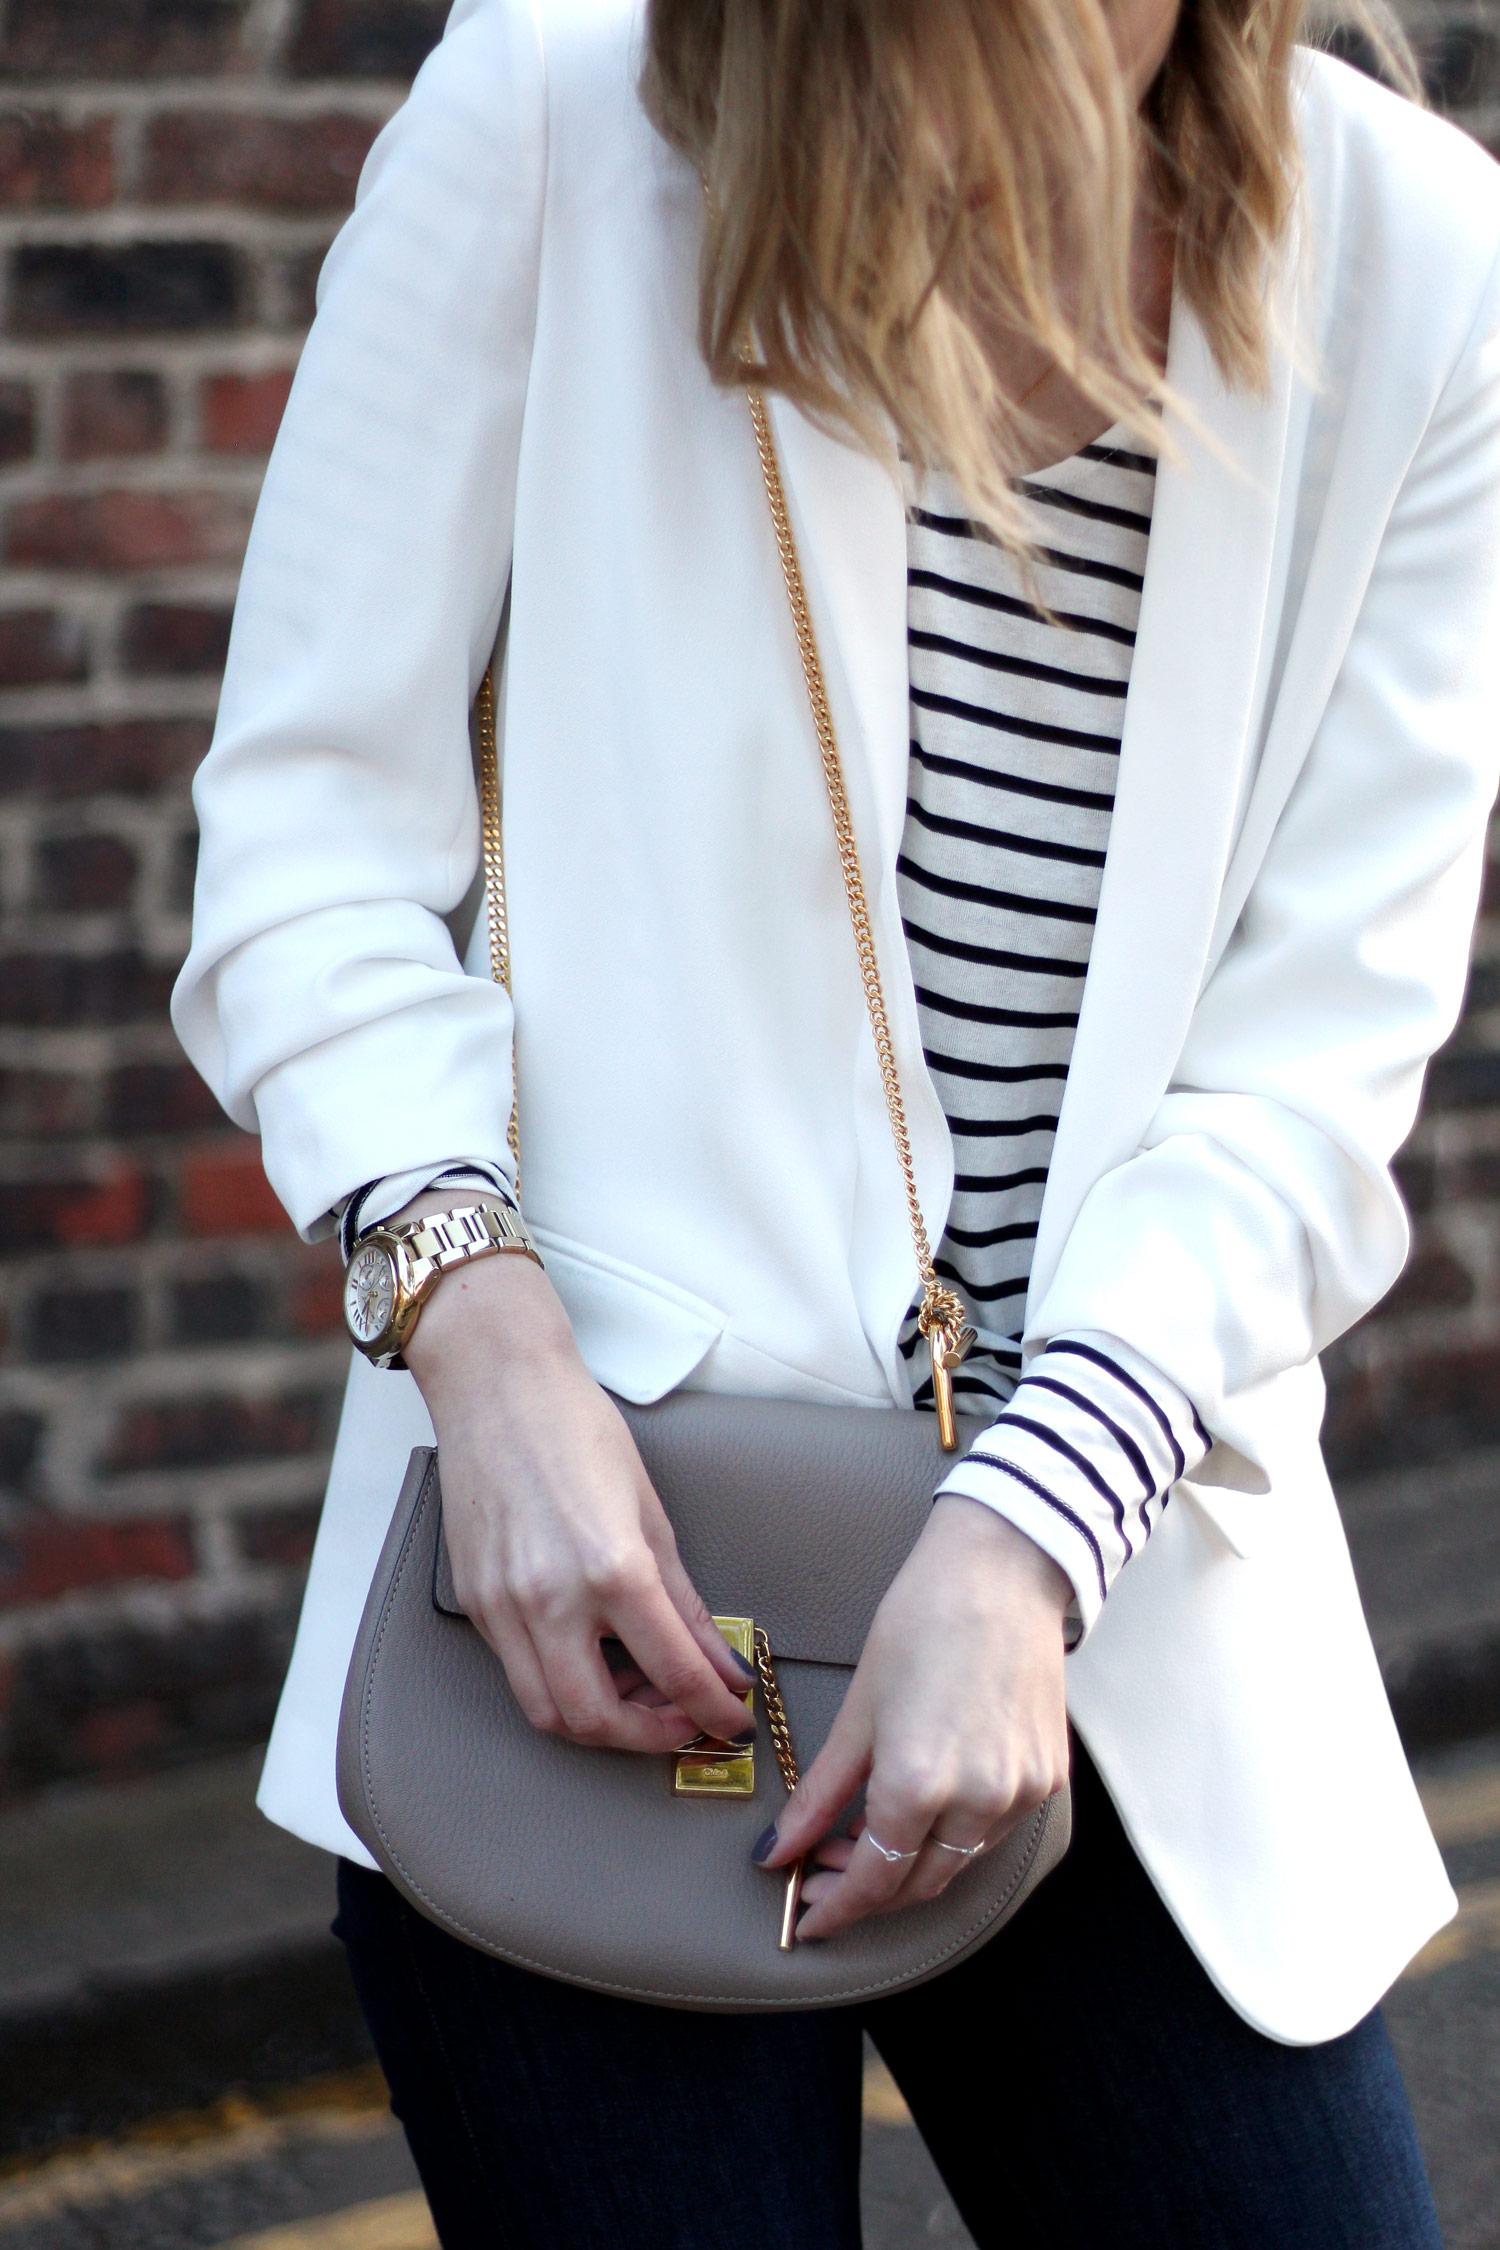 paige-denim-flares-stripe-breton-white-blazer-chloe-drew-grey-12